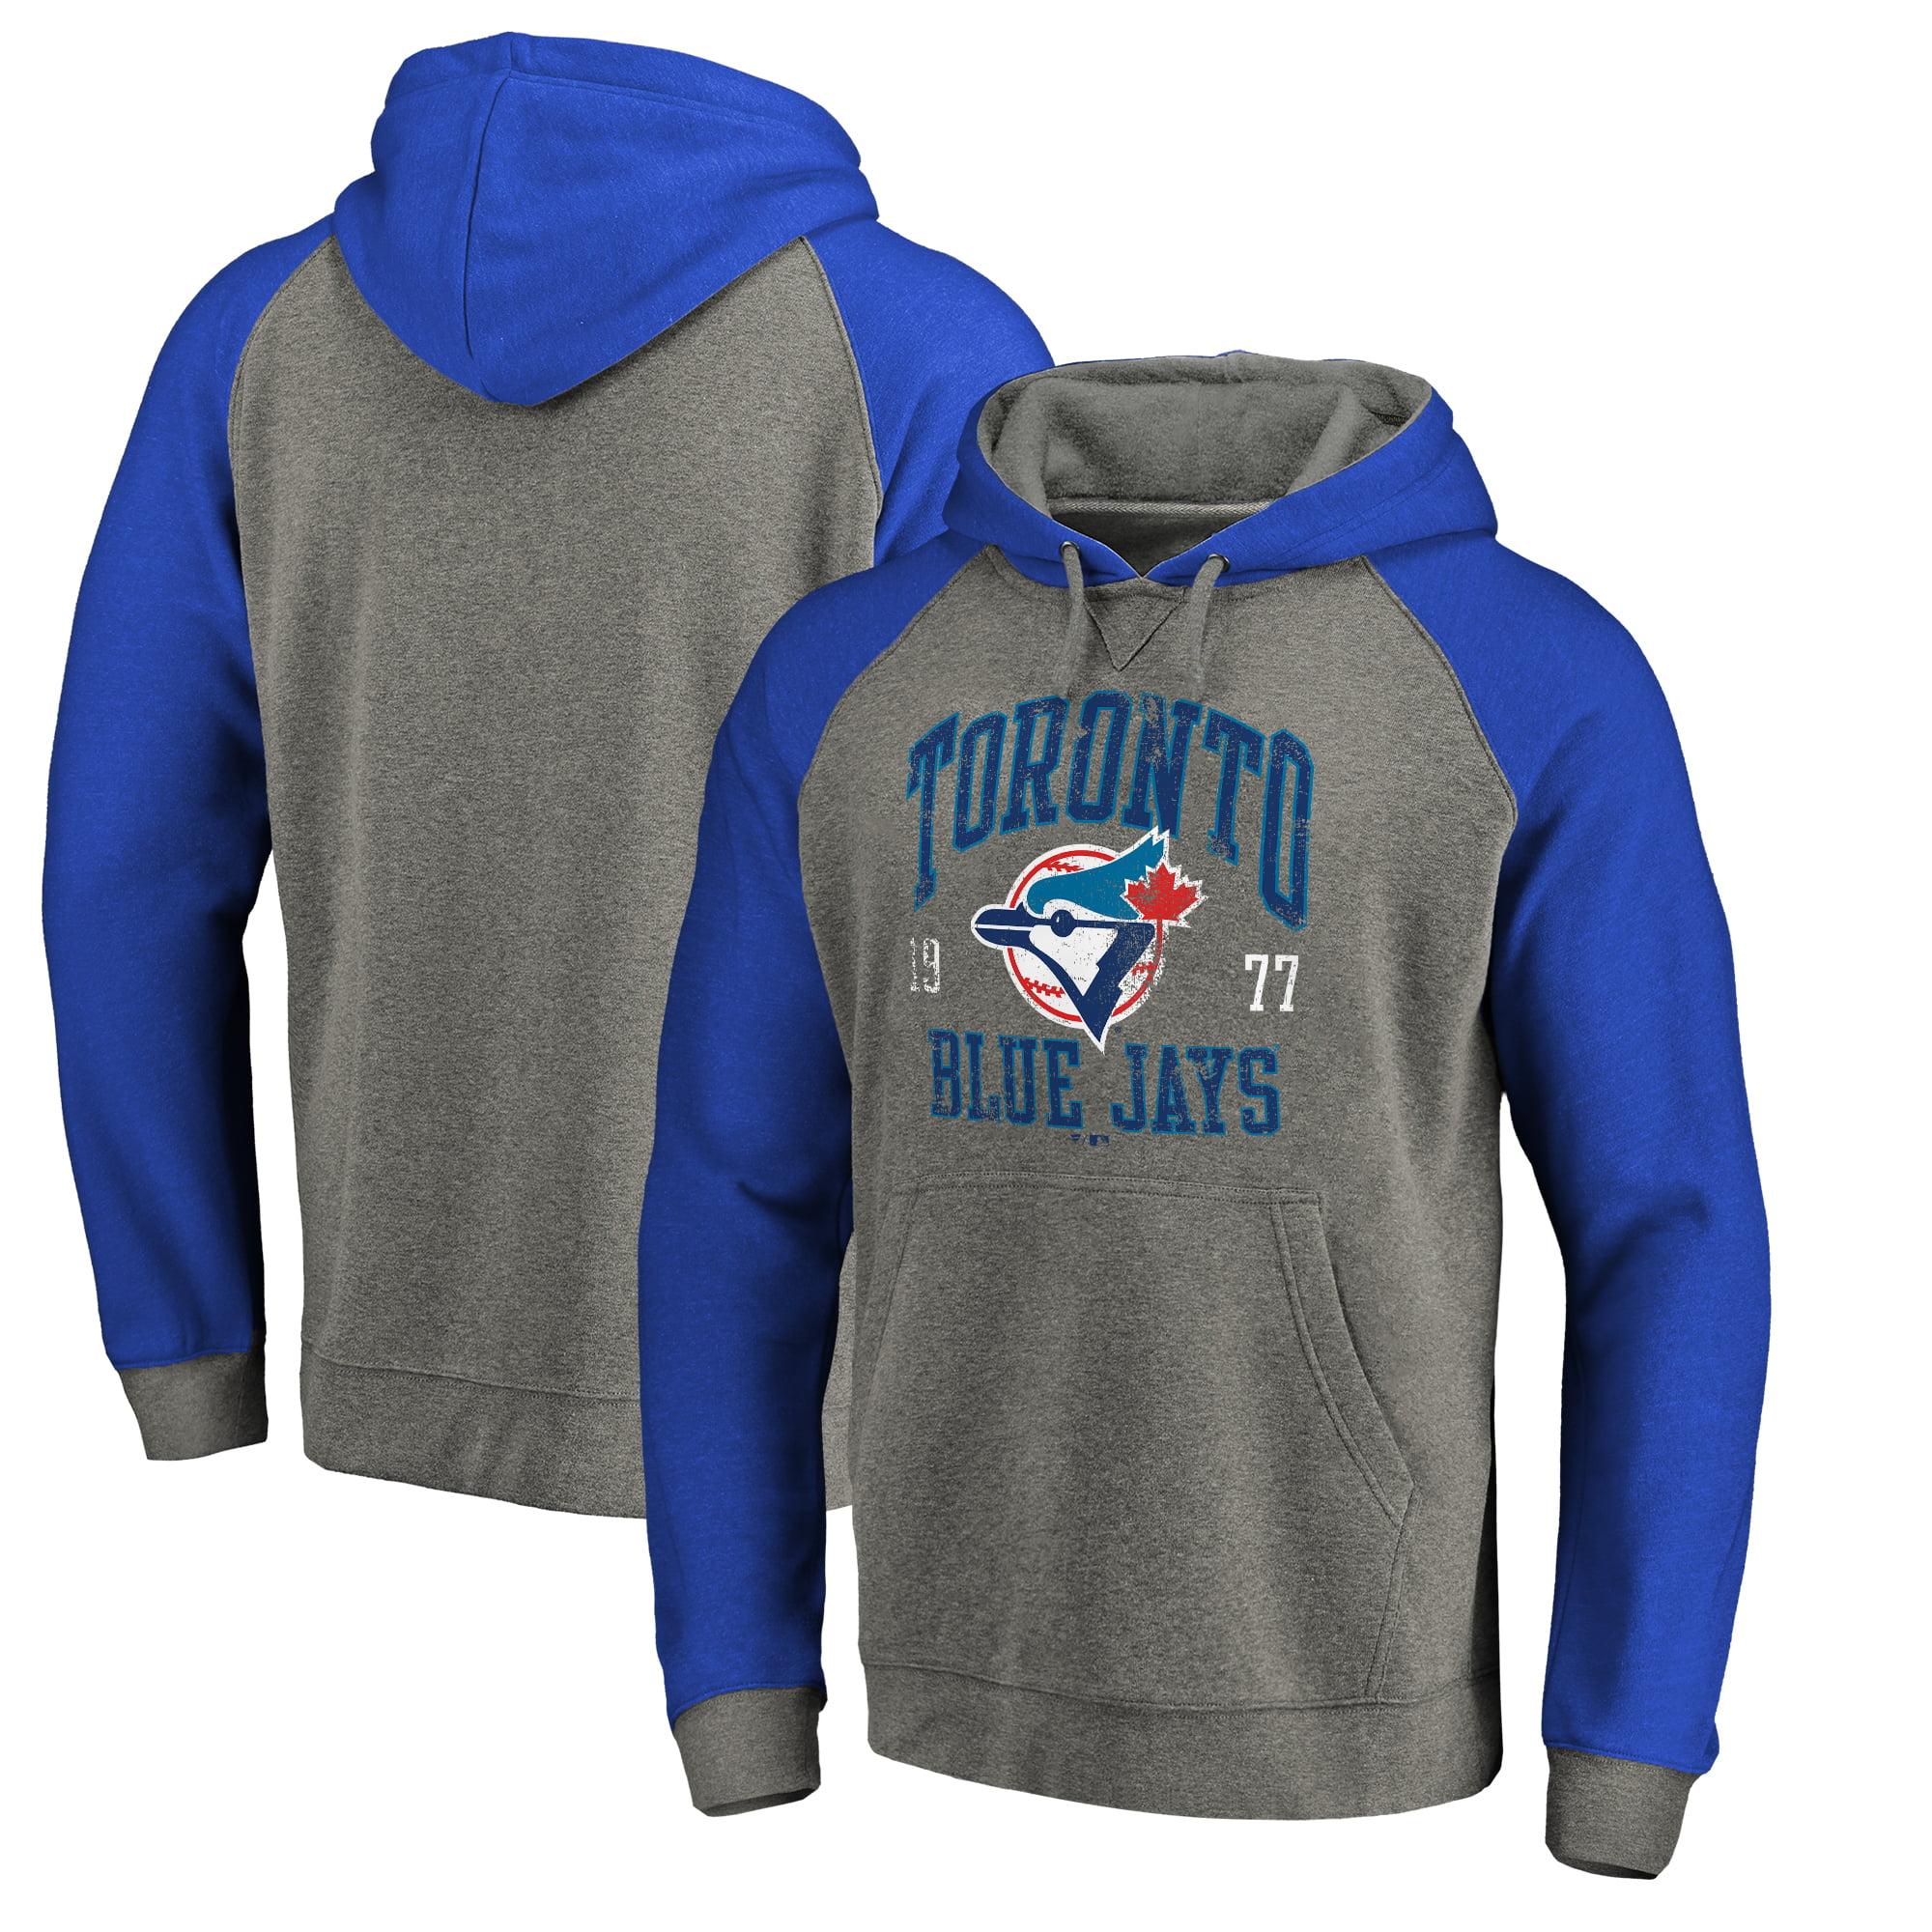 Toronto Blue Jays Fanatics Branded Cooperstown Collection Old Favorite Tri-Blend Raglan Pullover Hoodie - Ash